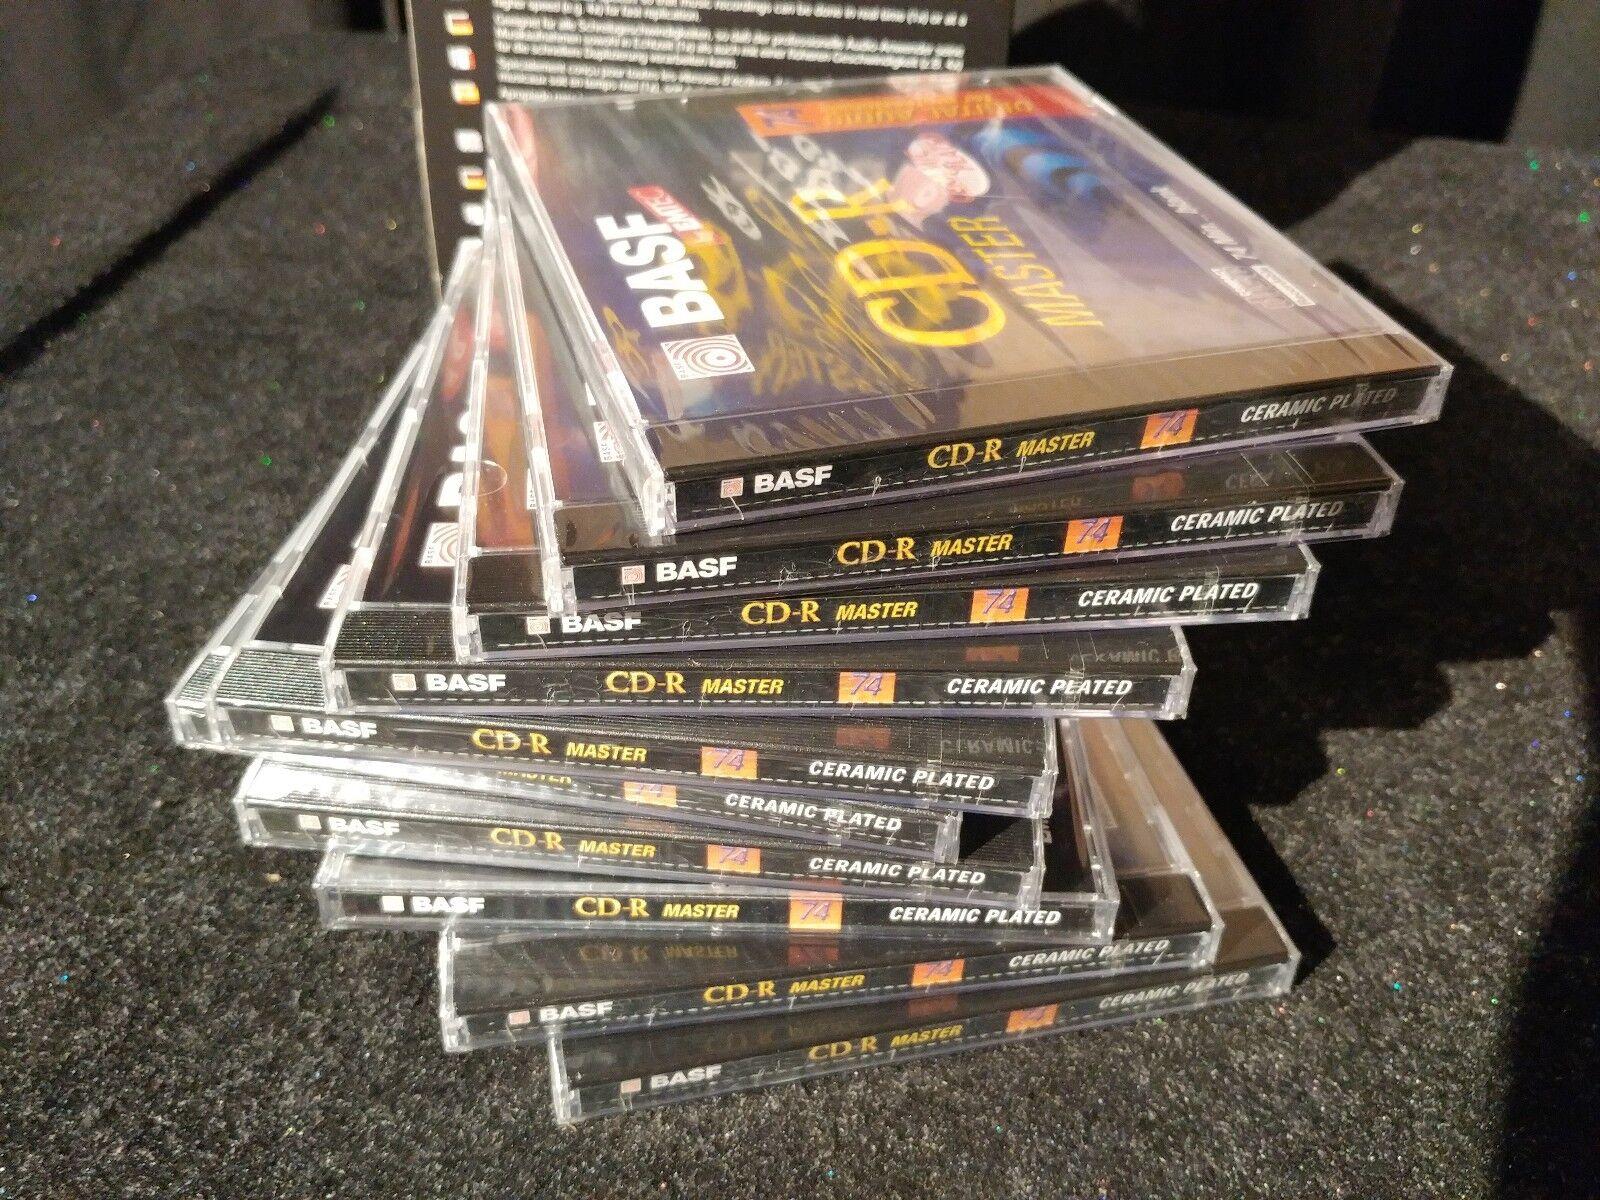 Box of 10 BASF CD-R MASTER 74 CERAMIC PLATED BLANK CD BY EMTEC BRAND NEW